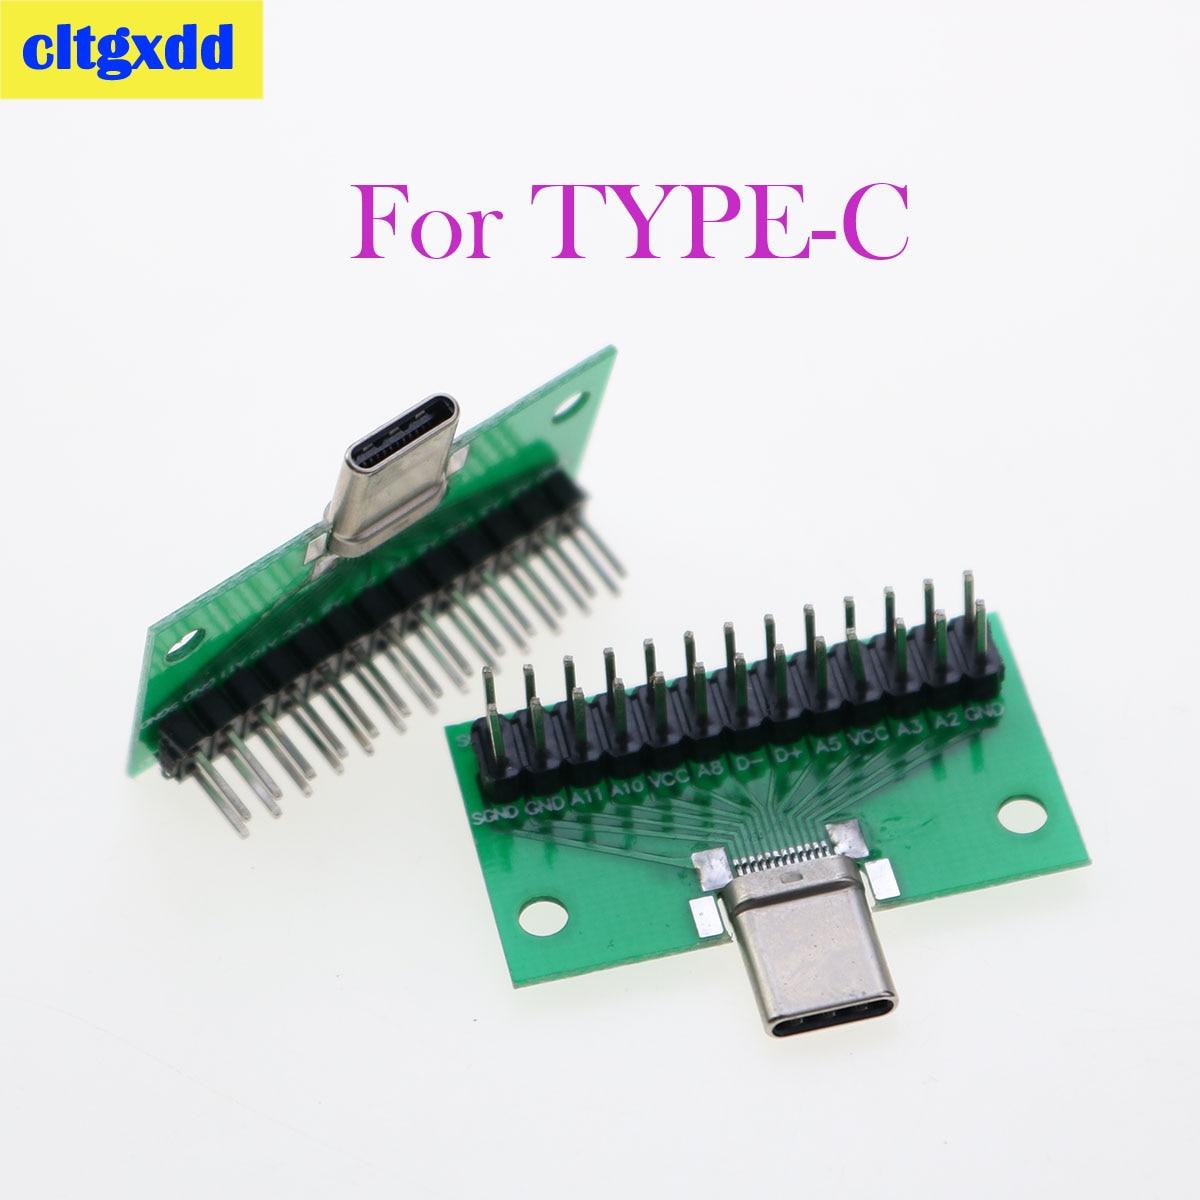 Cltgxdd 10 Uds Tipo-C macho a USB 3,1 prueba adaptador de placa...